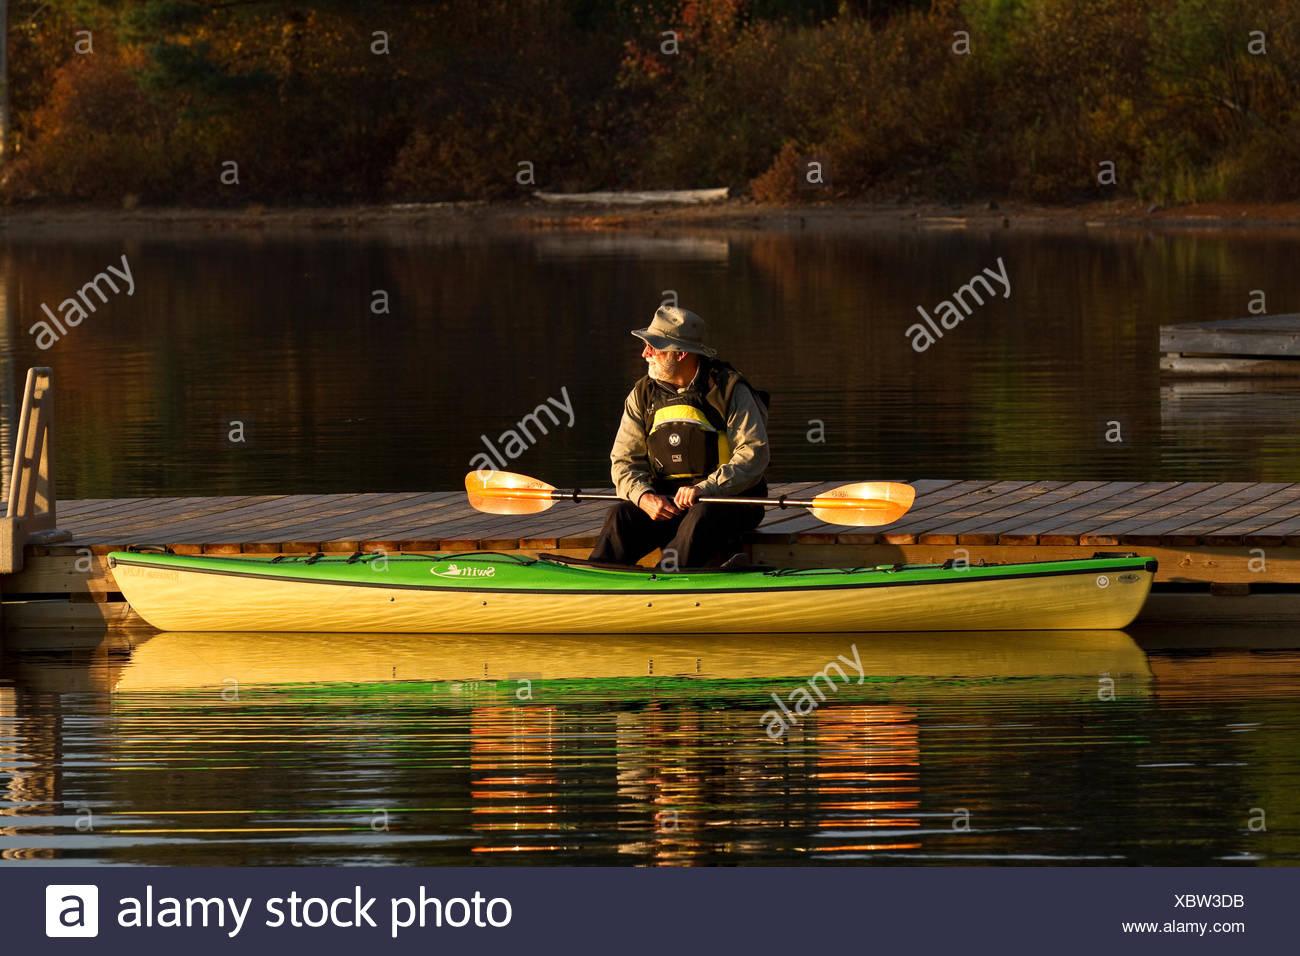 Homme âgé bénéficie d'matin calme sur un quai avec kayak sur le lac Oxtongue, Muskoka, Ontario, Canada. Photo Stock